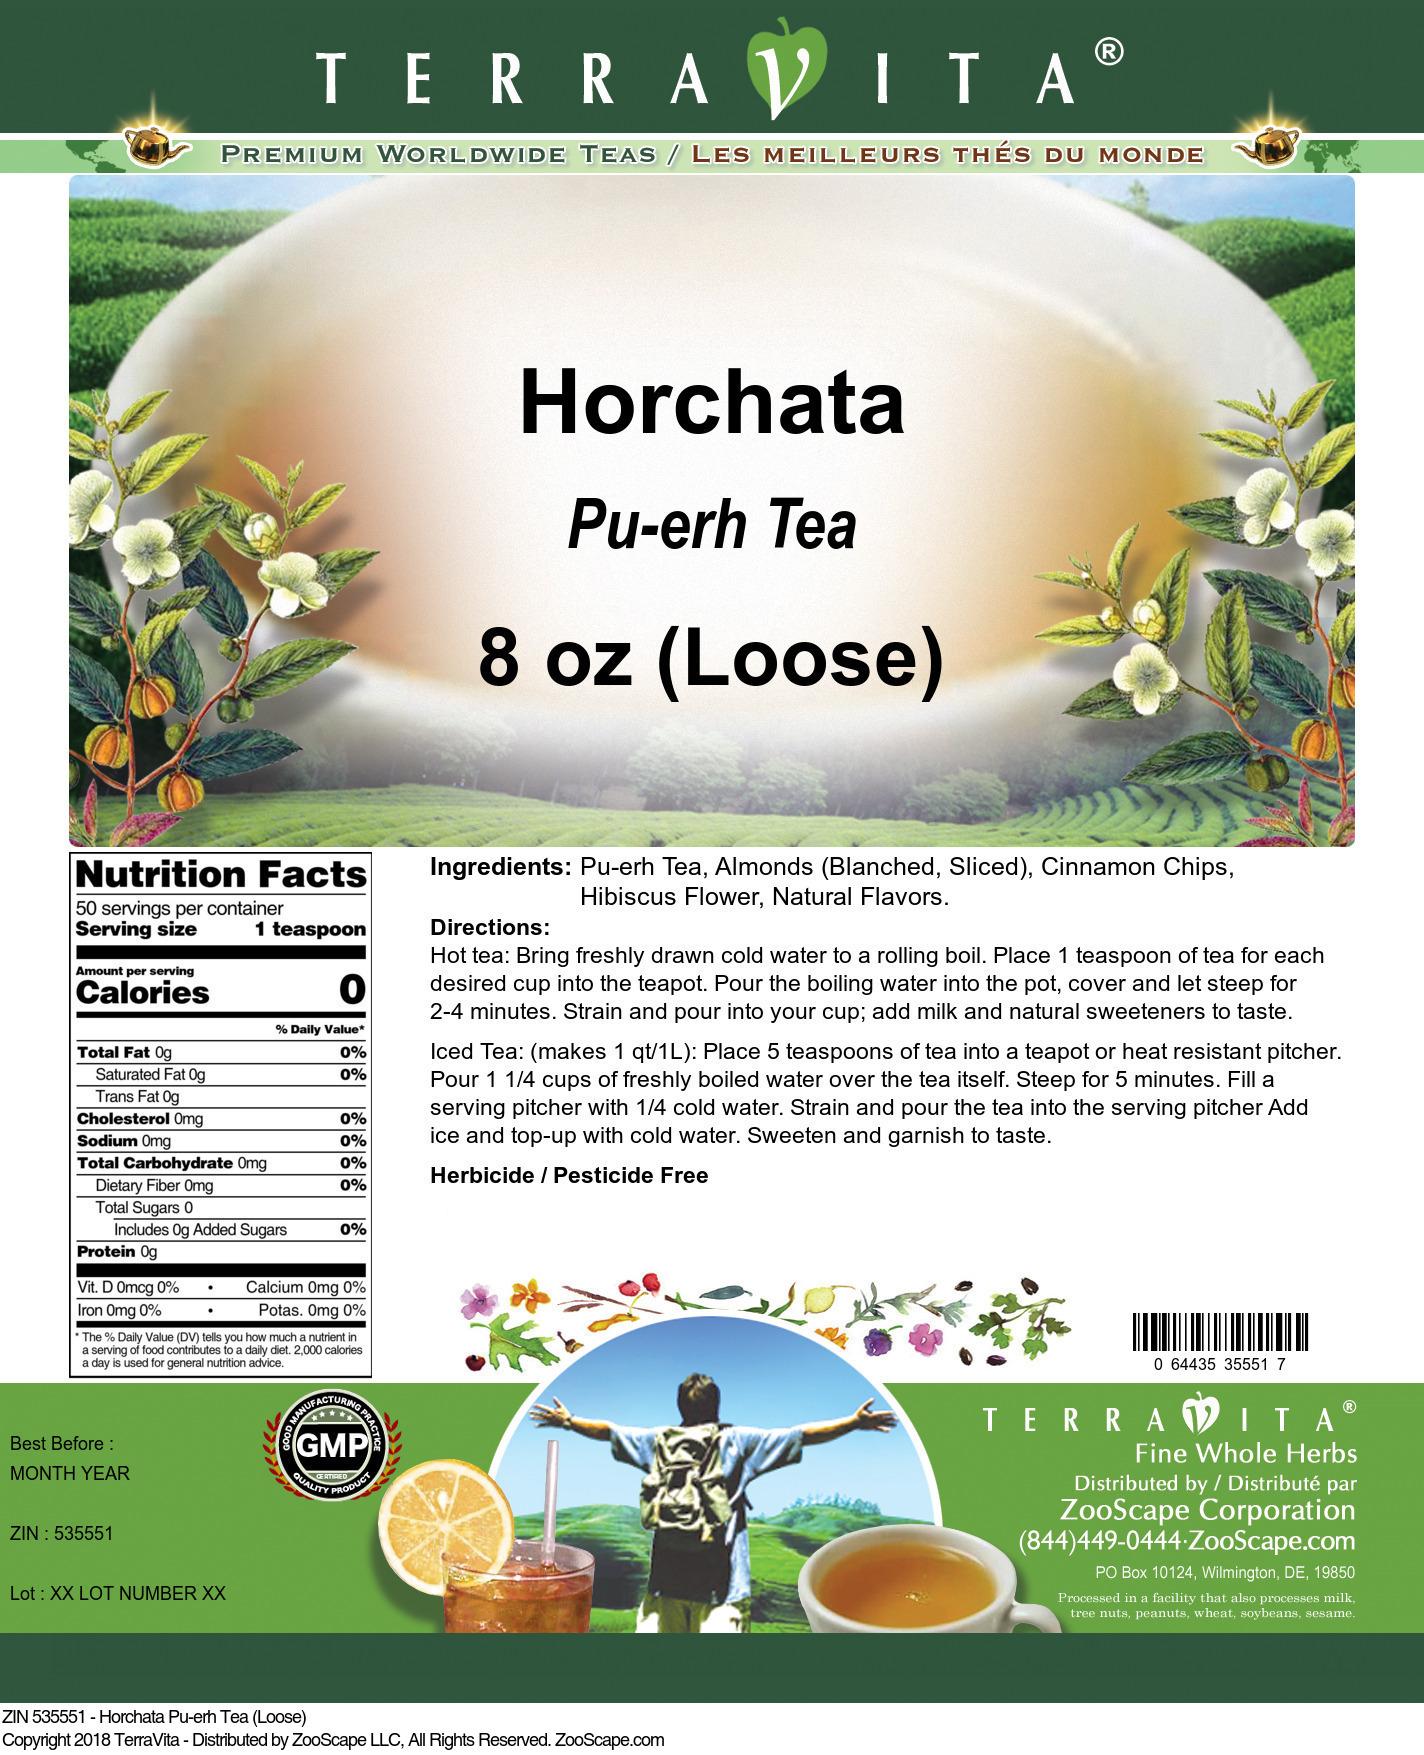 Horchata Pu-erh Tea (Loose)